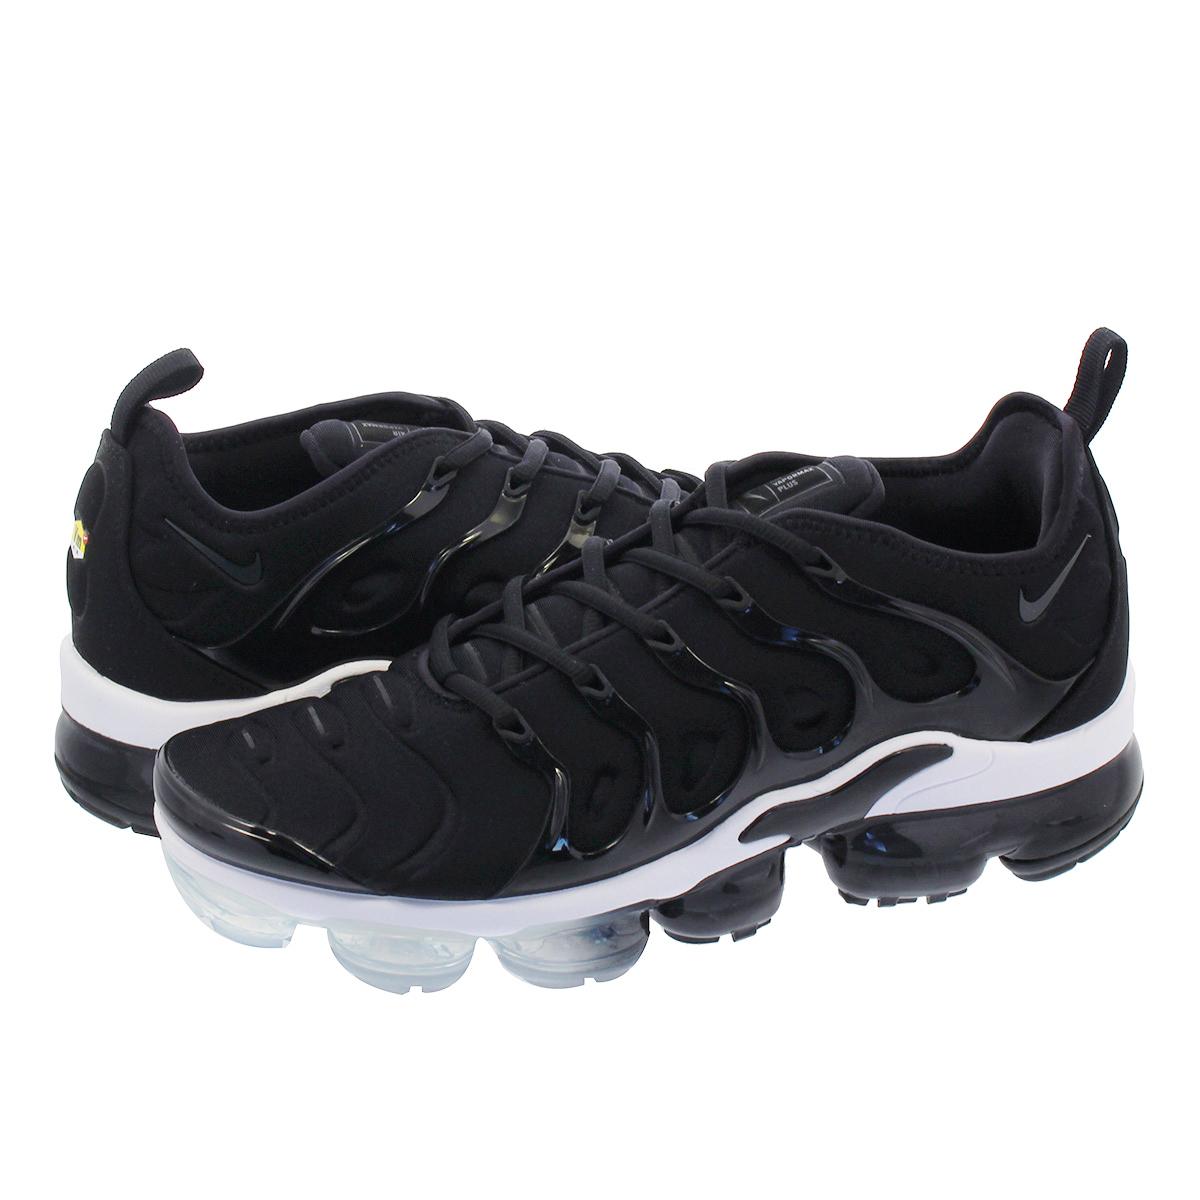 huge discount d6b65 22718 NIKE AIR VAPORMAX PLUS Nike vapor max plus BLACK/ANTHRACITE/WHITE  924,453-010